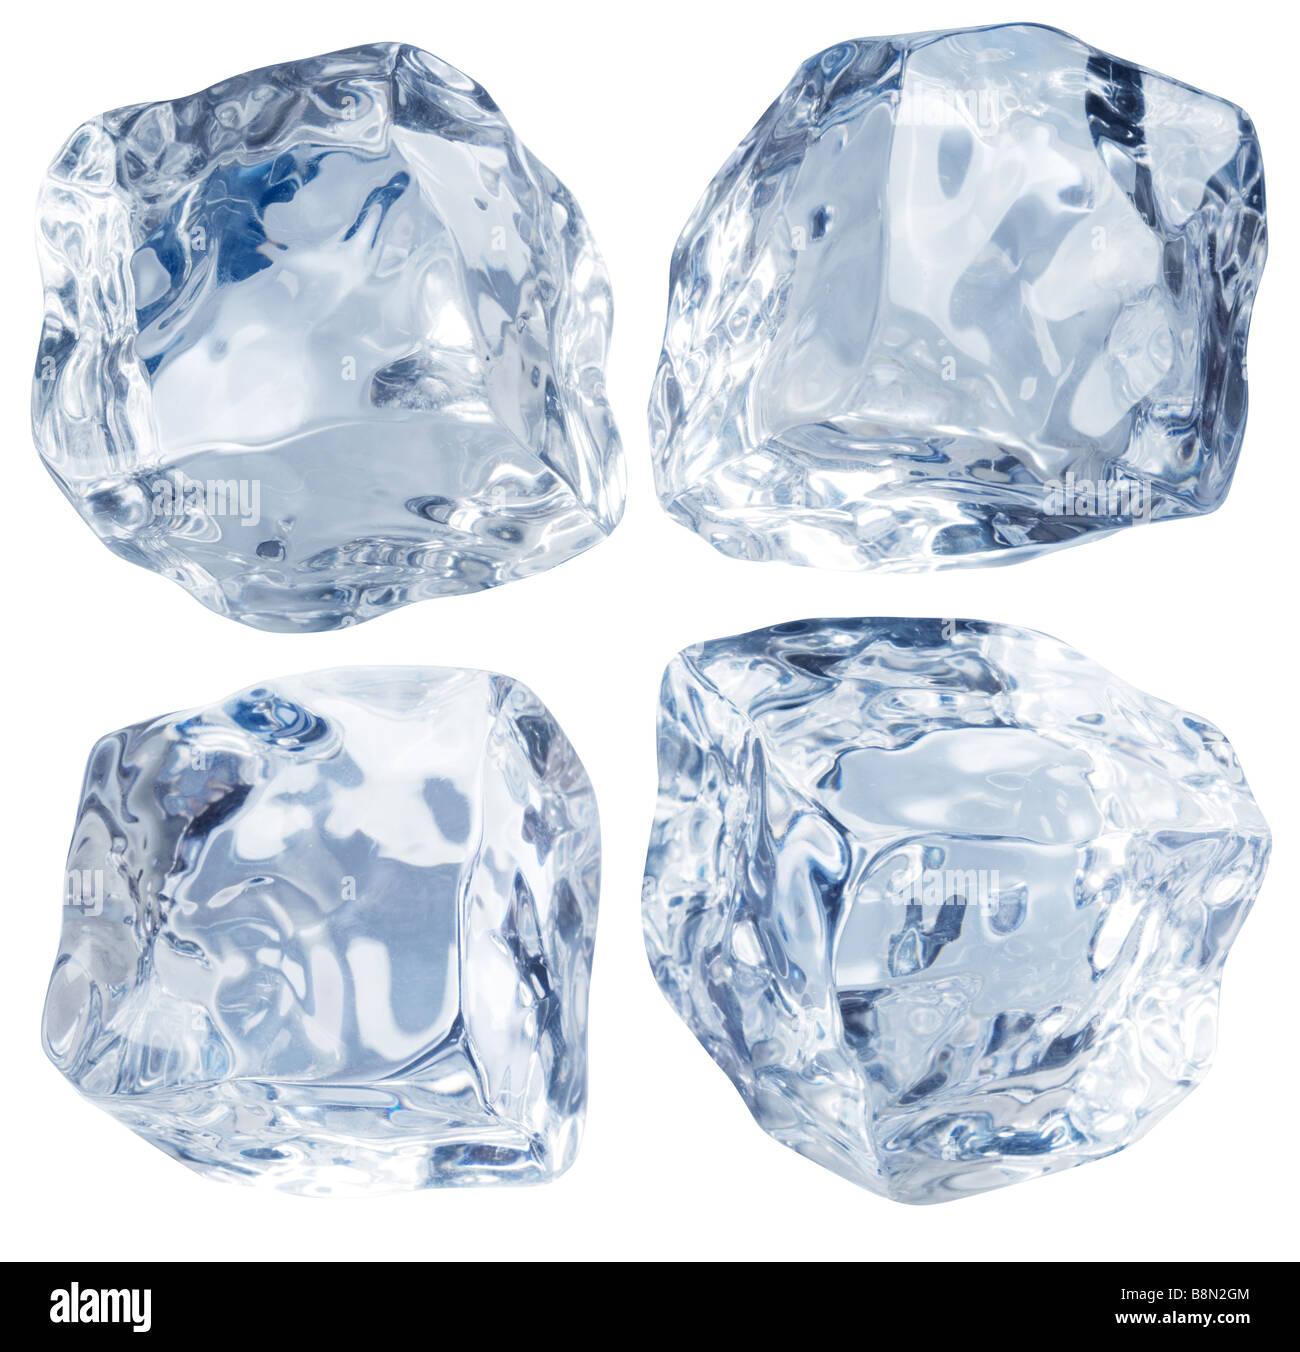 ice cube - Stock Image